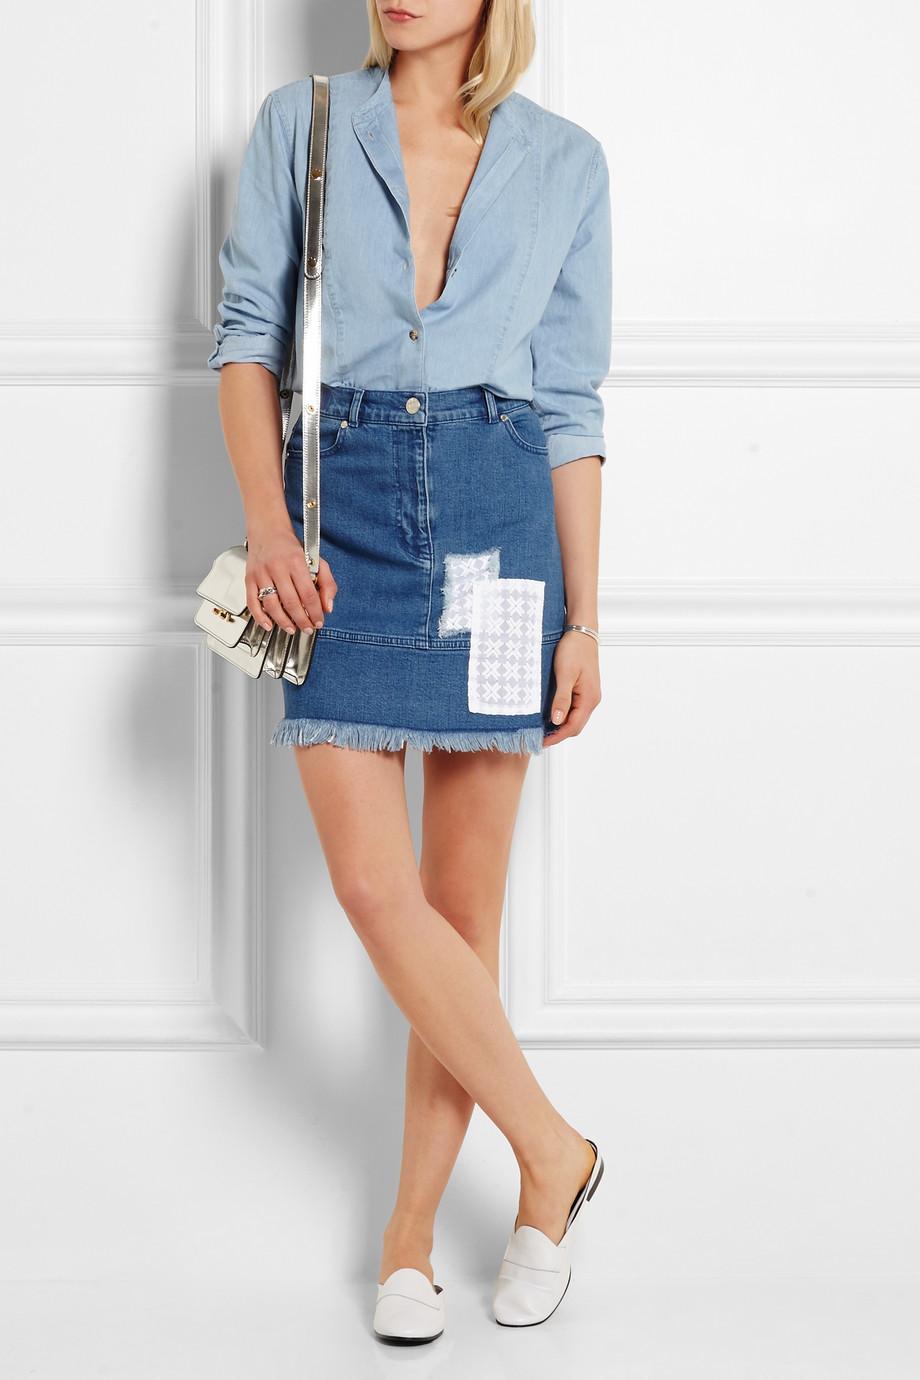 denim skirt style 4